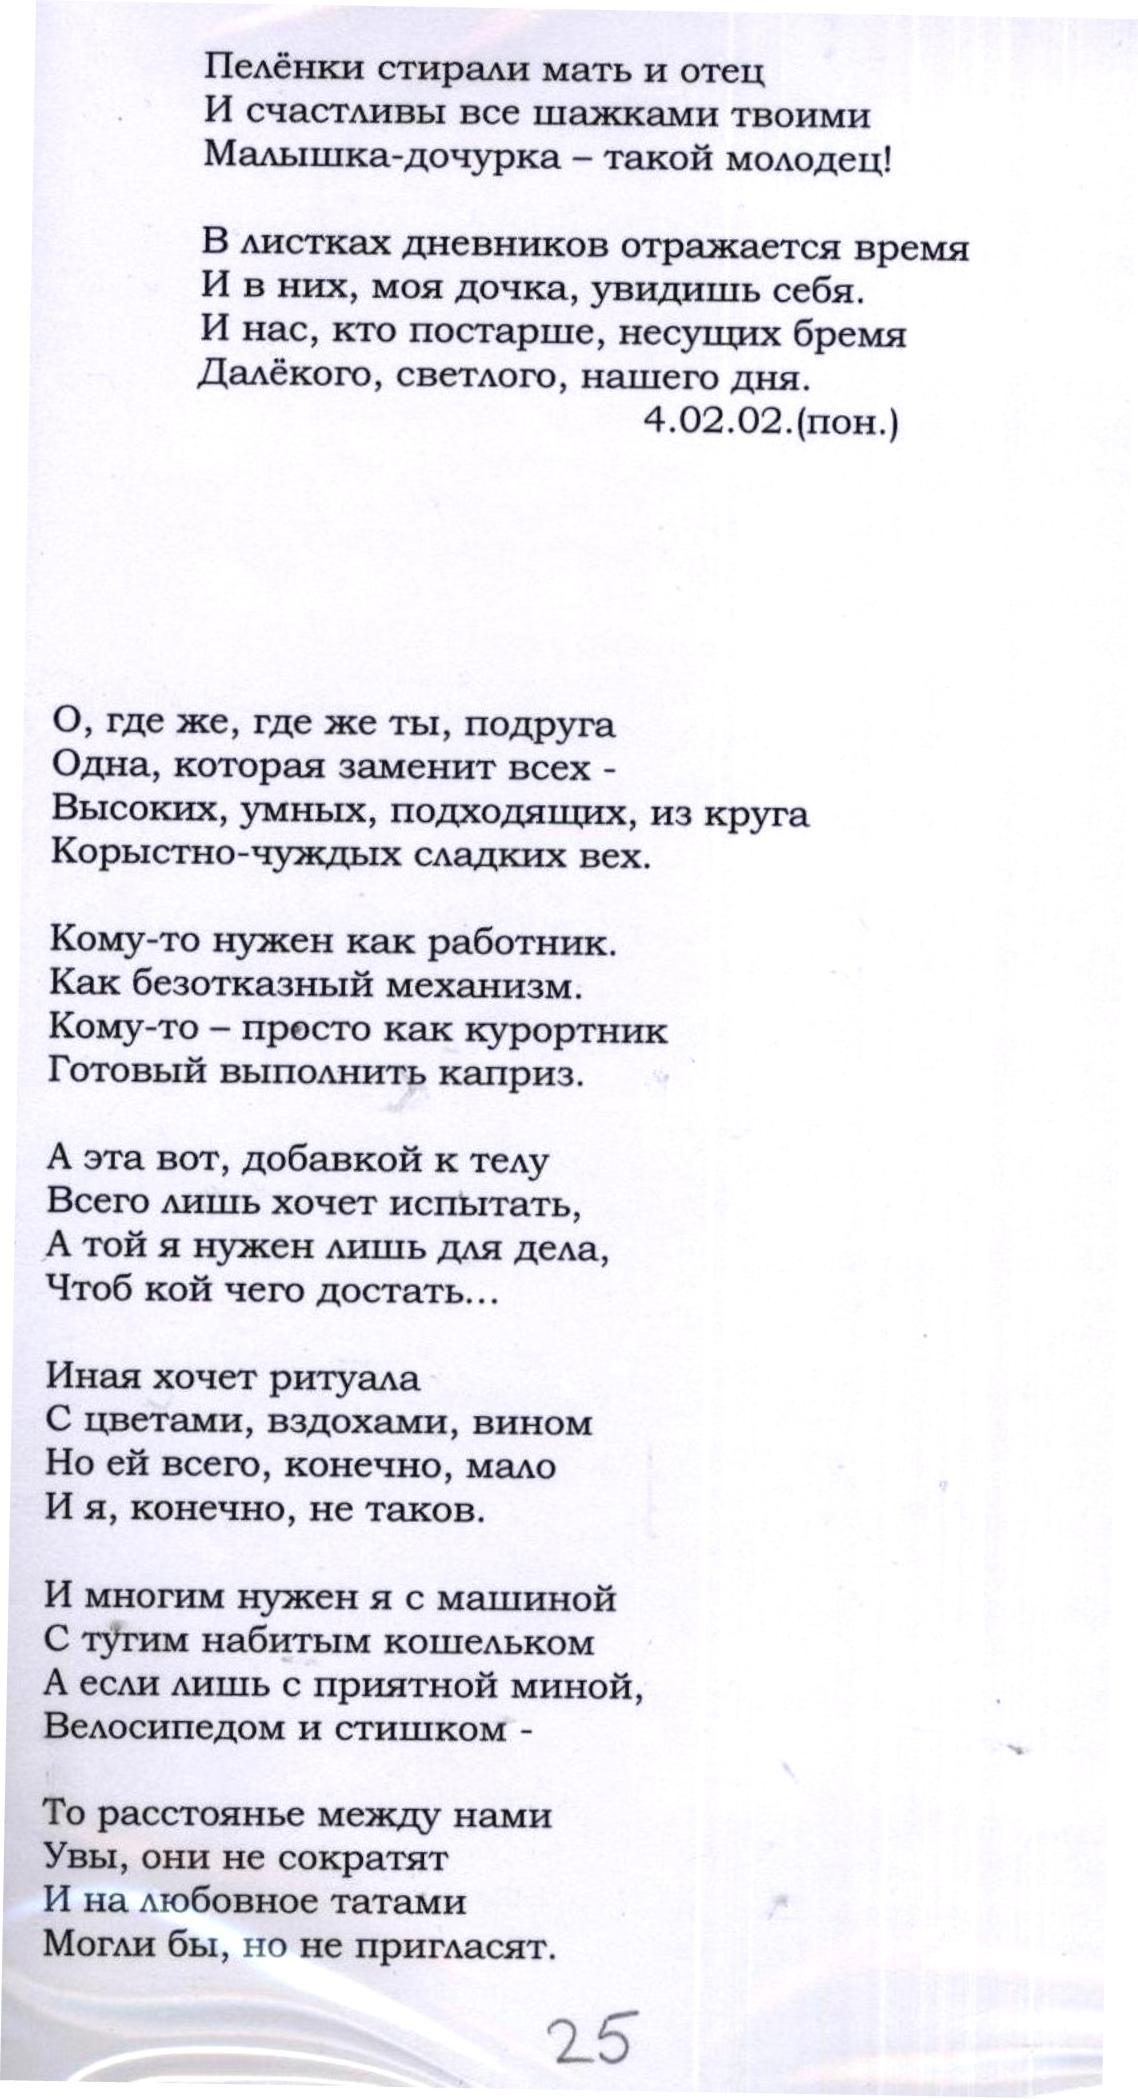 Стихи 024.jpg